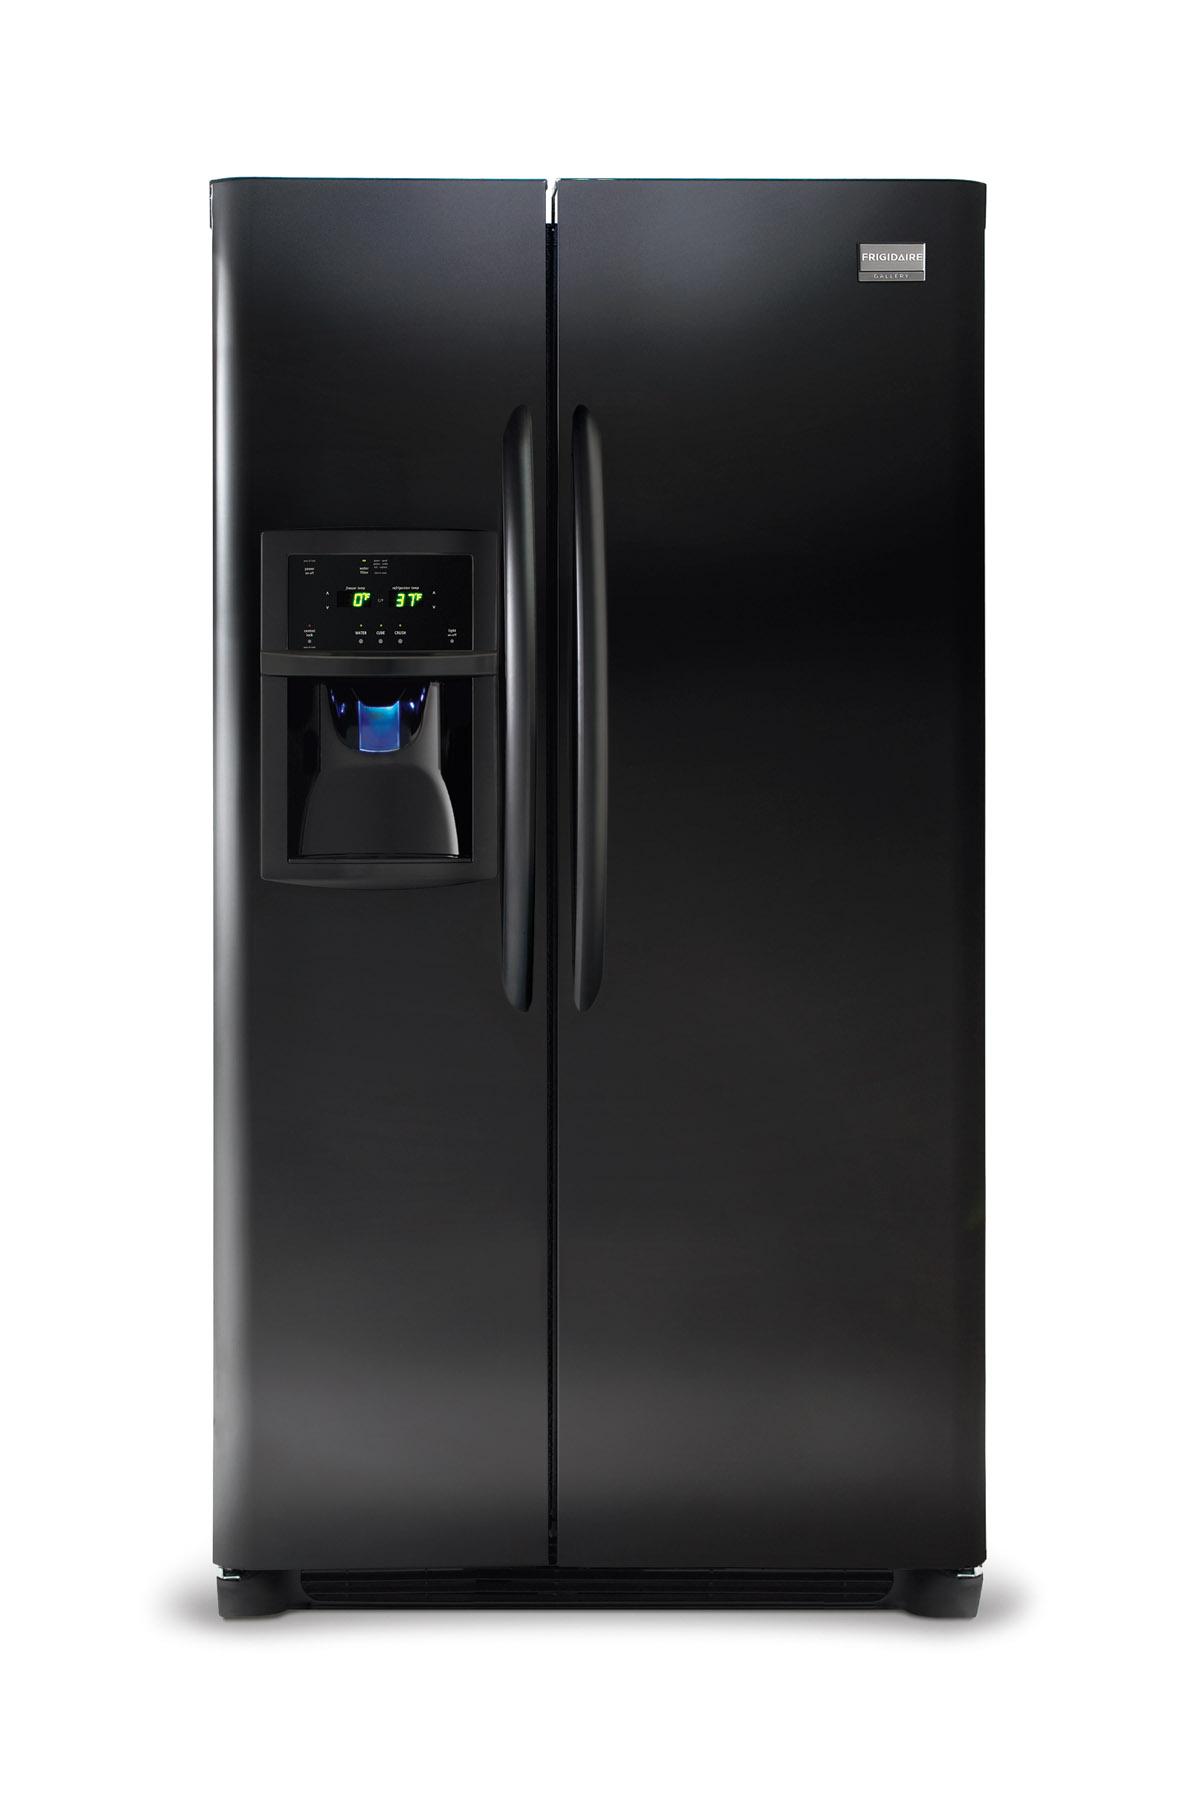 Frigidaire Refrigerator Model FGHS2634KE1 Parts